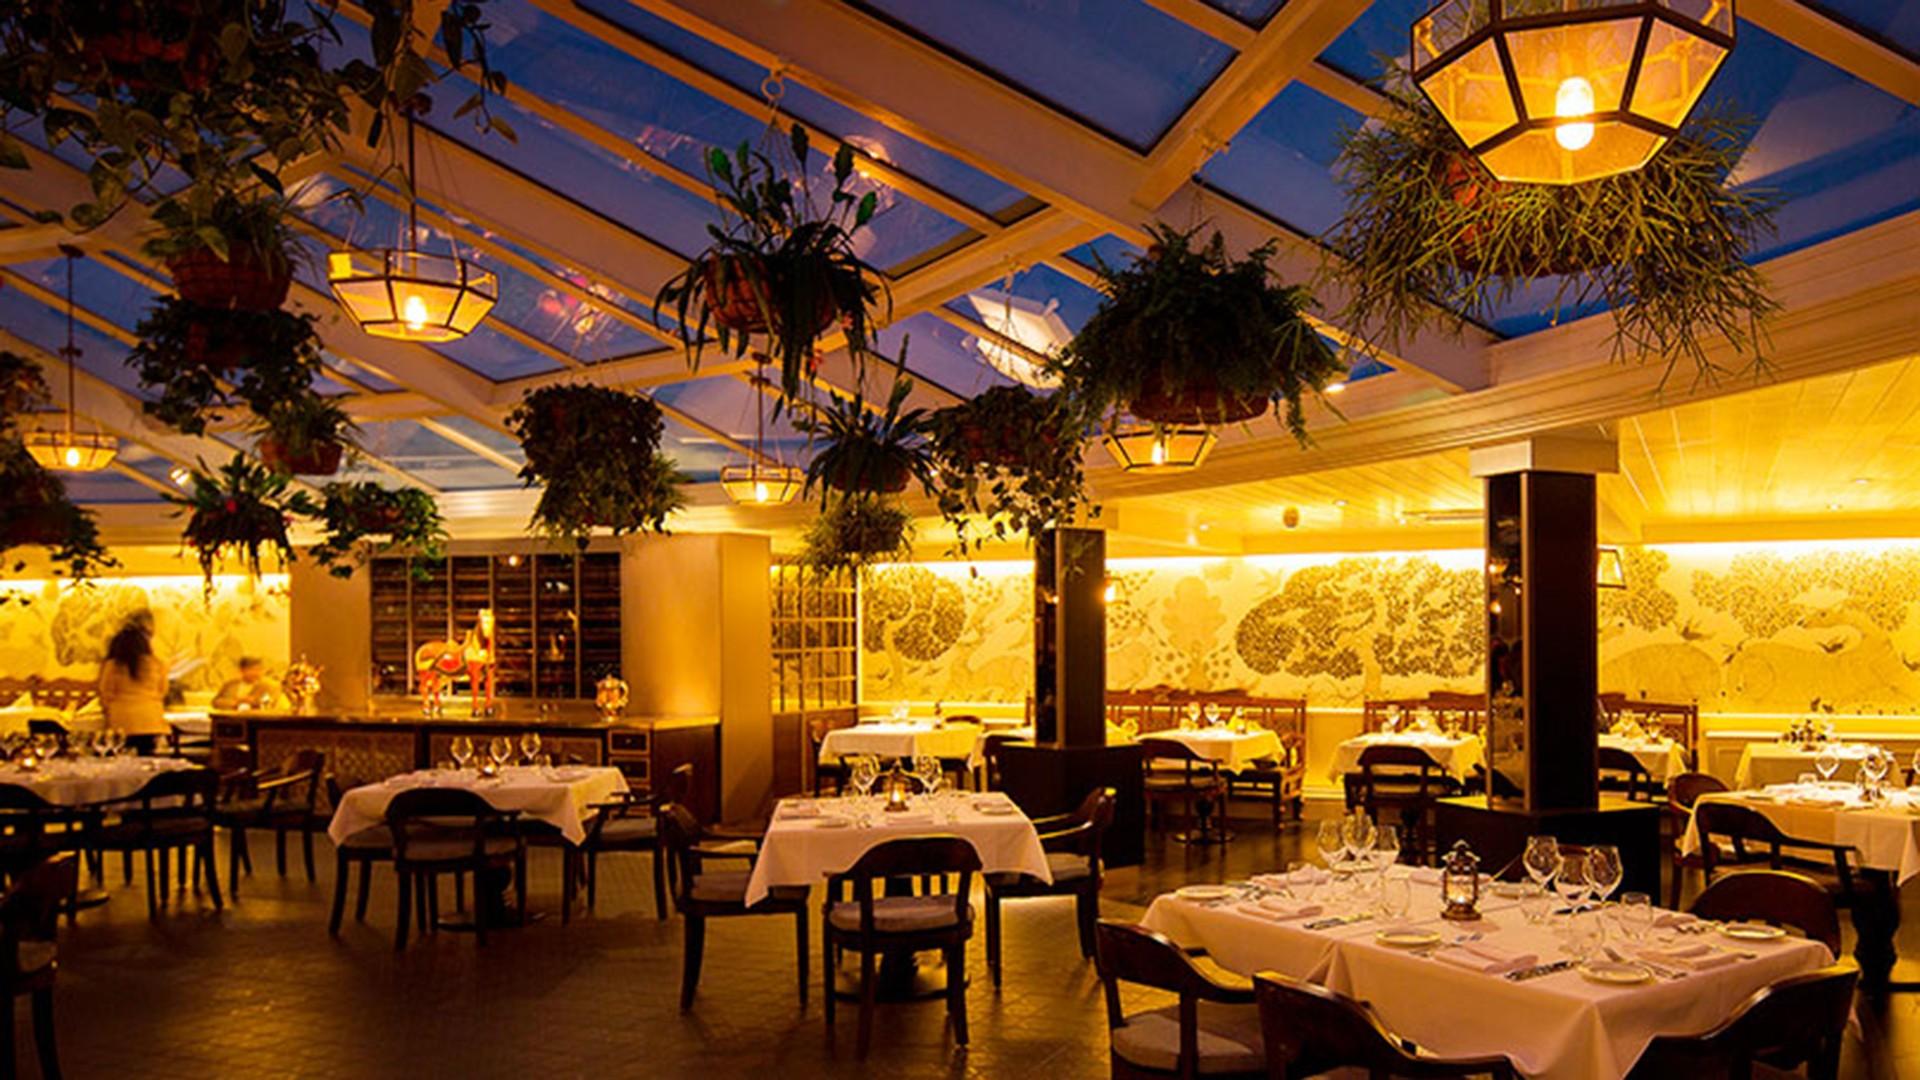 Bombay Brasserie interior